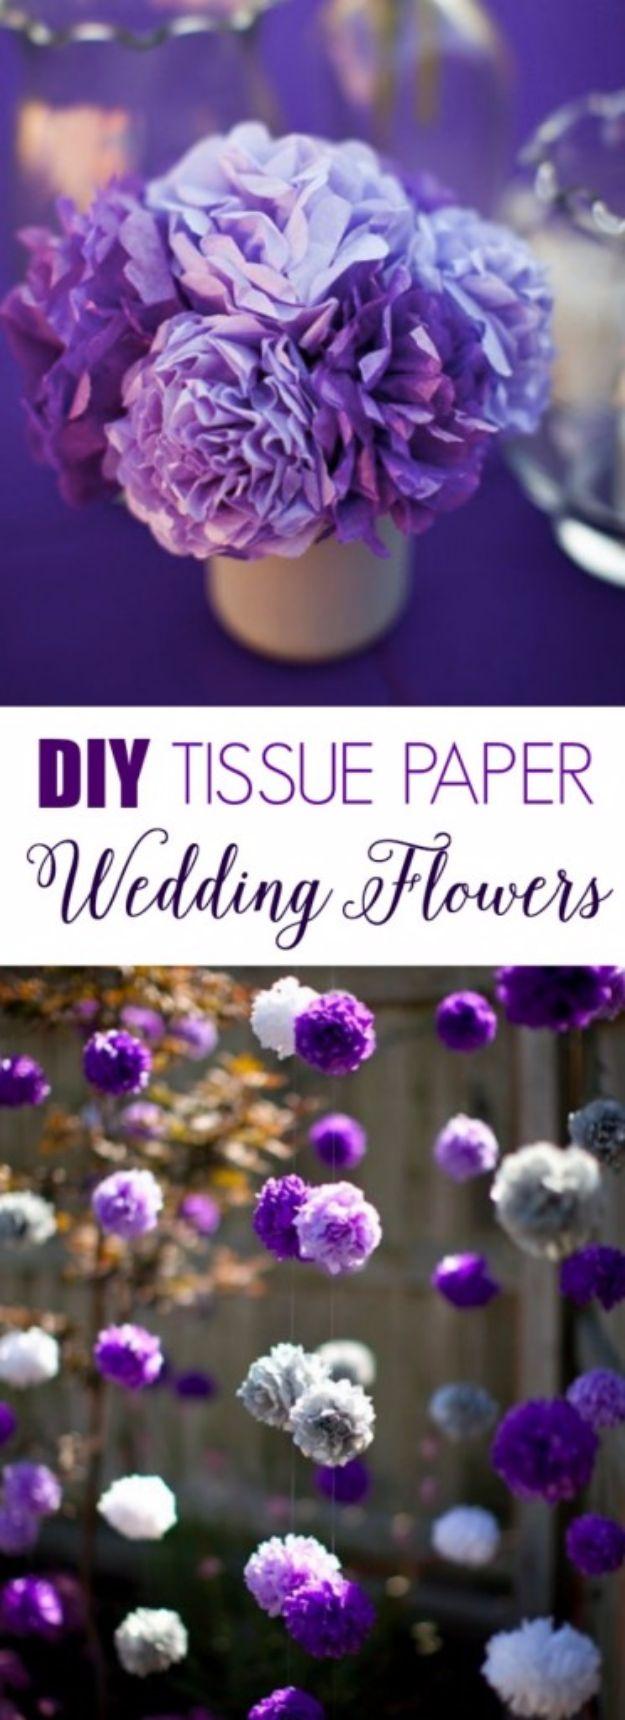 Wedding Decor Diy Ideas 34 Diy Wedding Decor Ideas For The Bride On A Budget